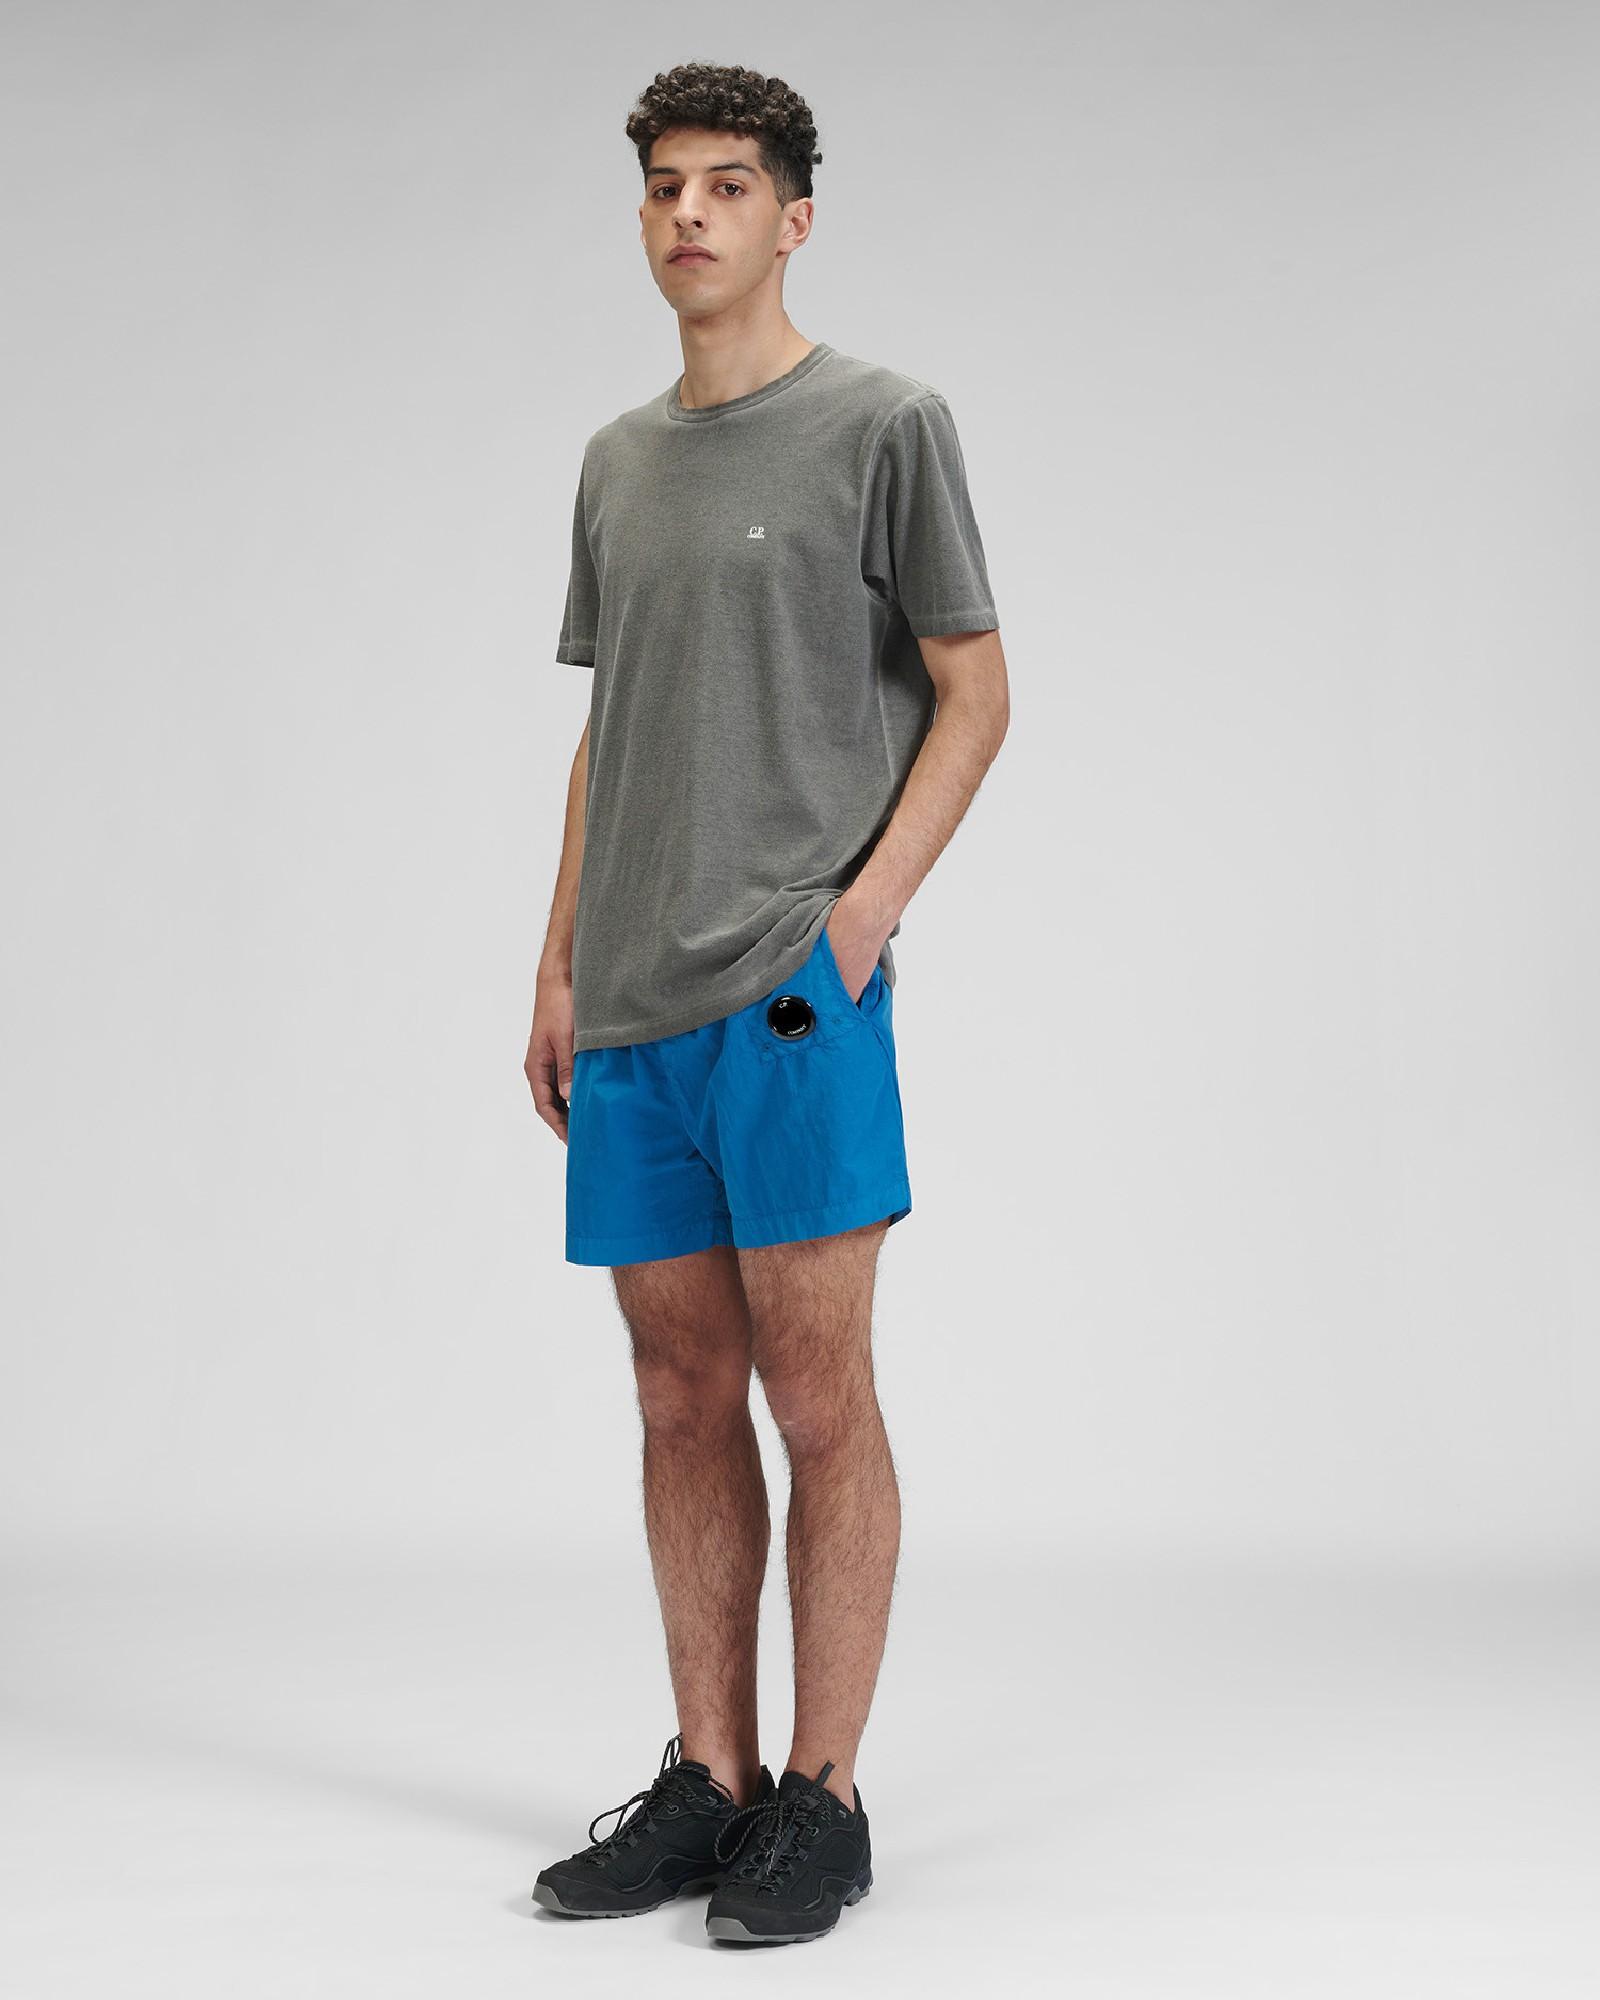 T-shirt Basic C.P. COMPANY | T-shirt | MTS199A00 5697S999